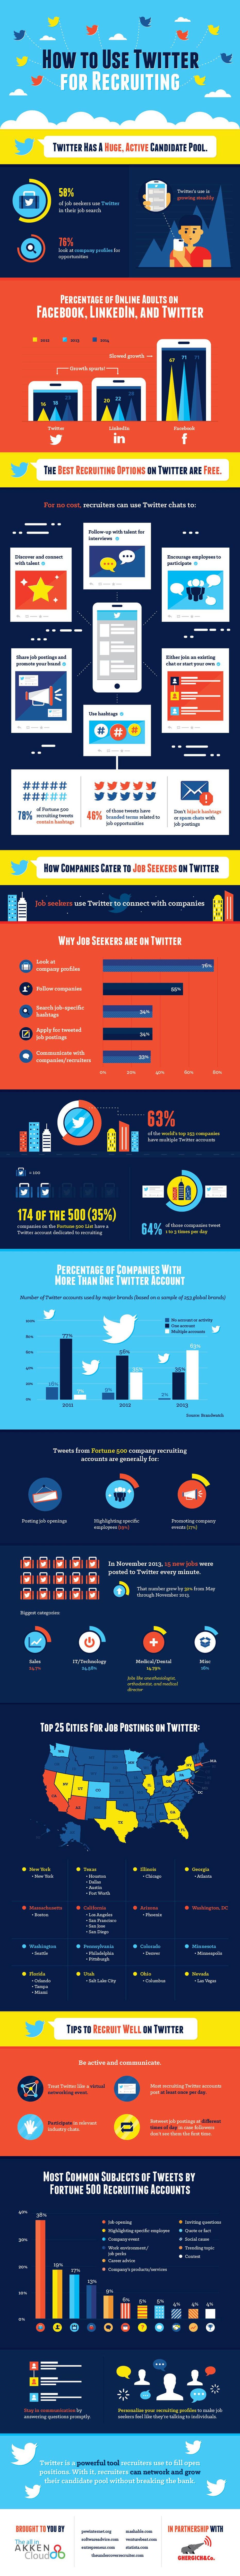 Aprende a usar Twitter para reclutar personal